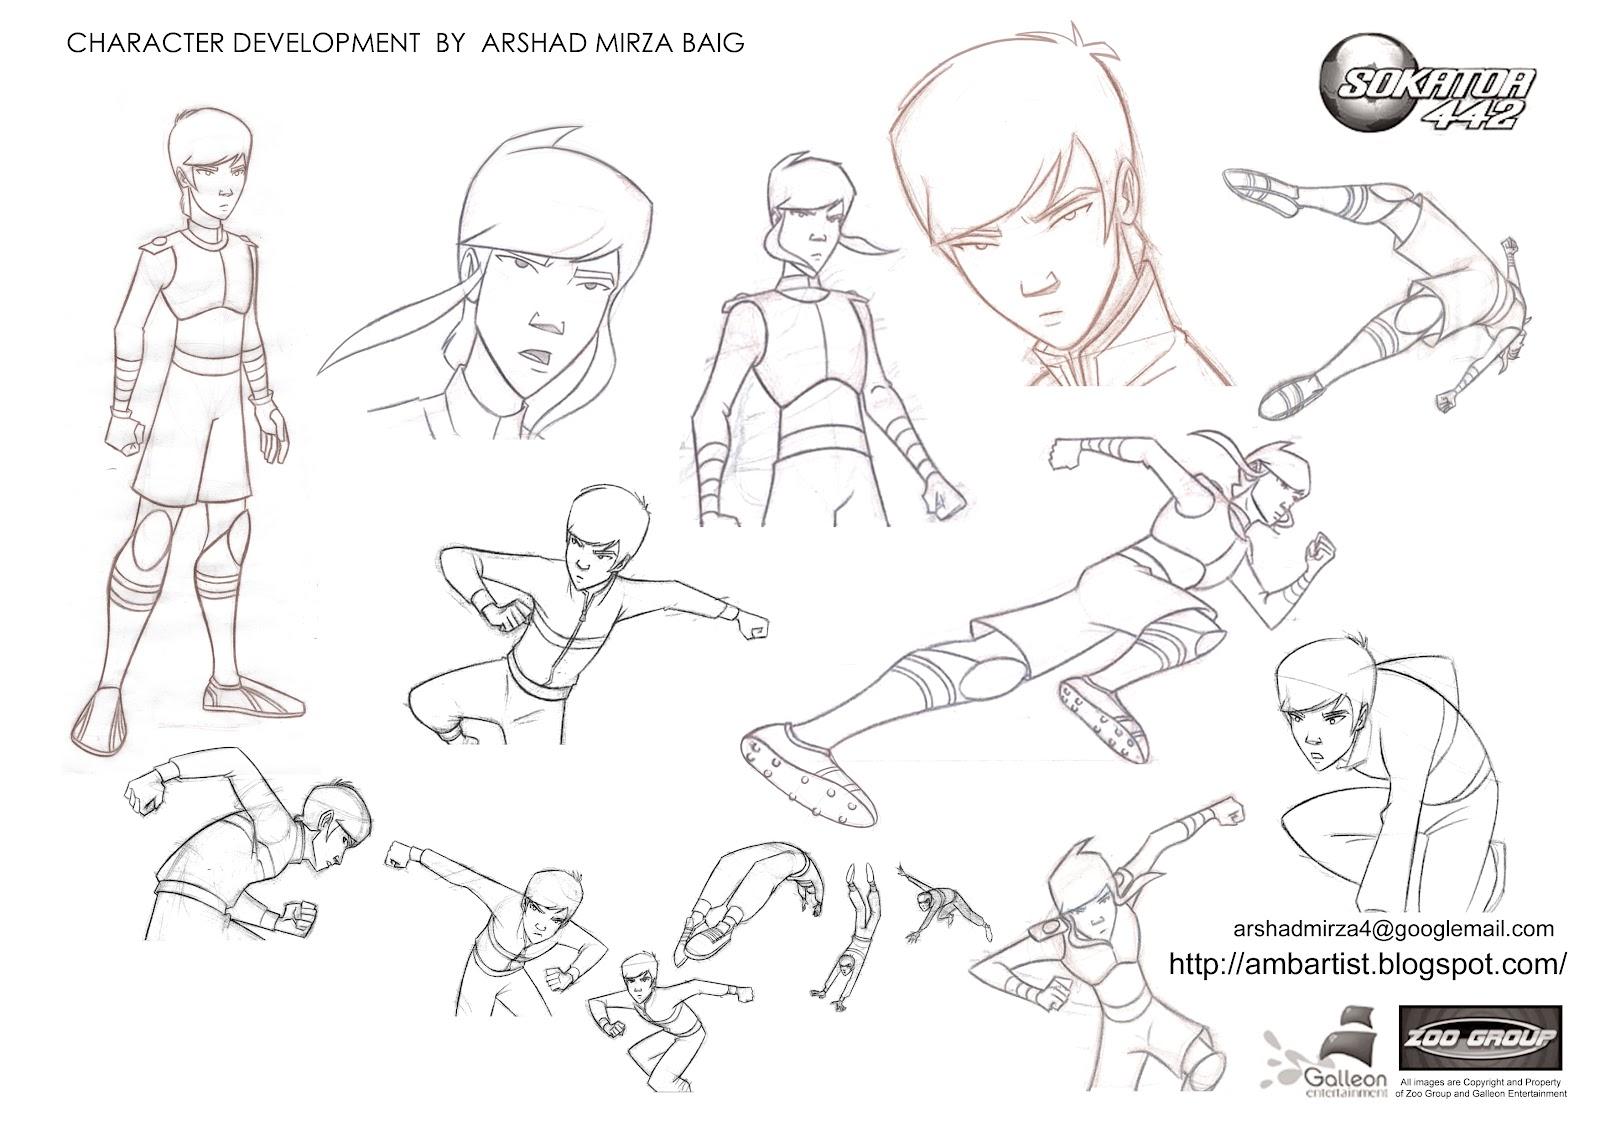 Character Development In Design : Arshad mirza baig portfolio character development art